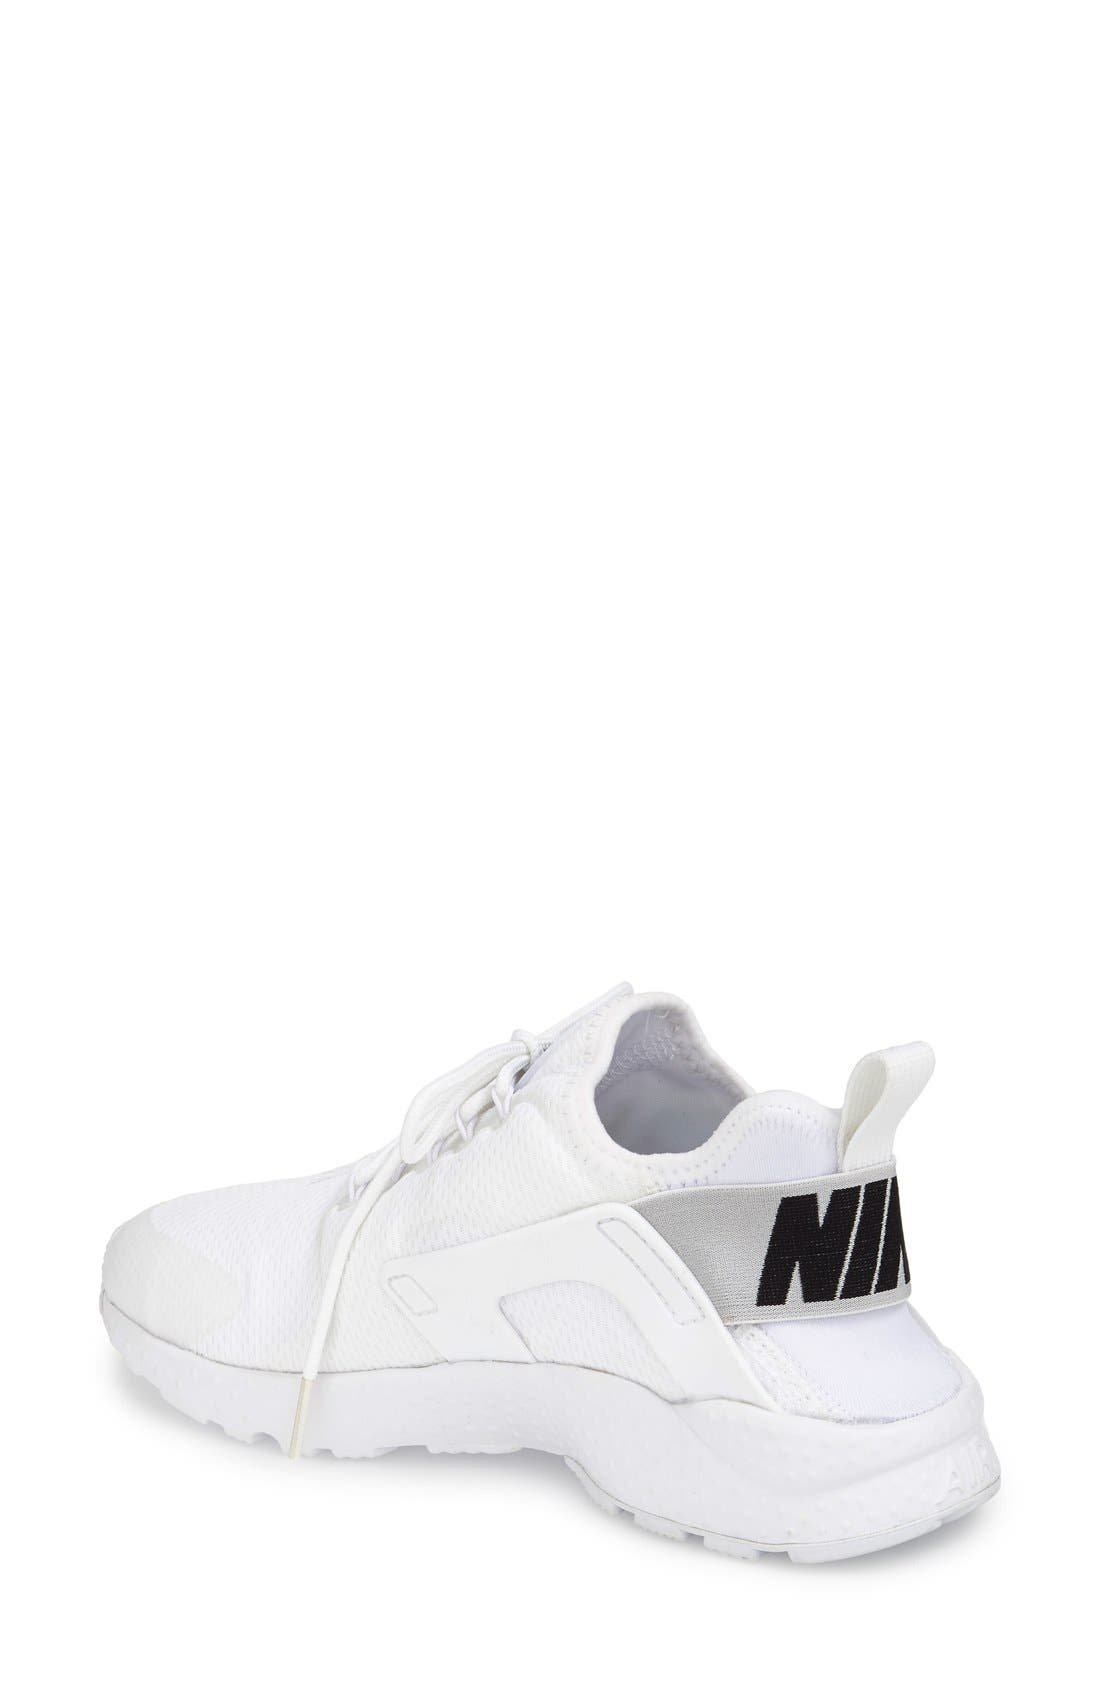 Air Huarache Sneaker,                             Alternate thumbnail 96, color,